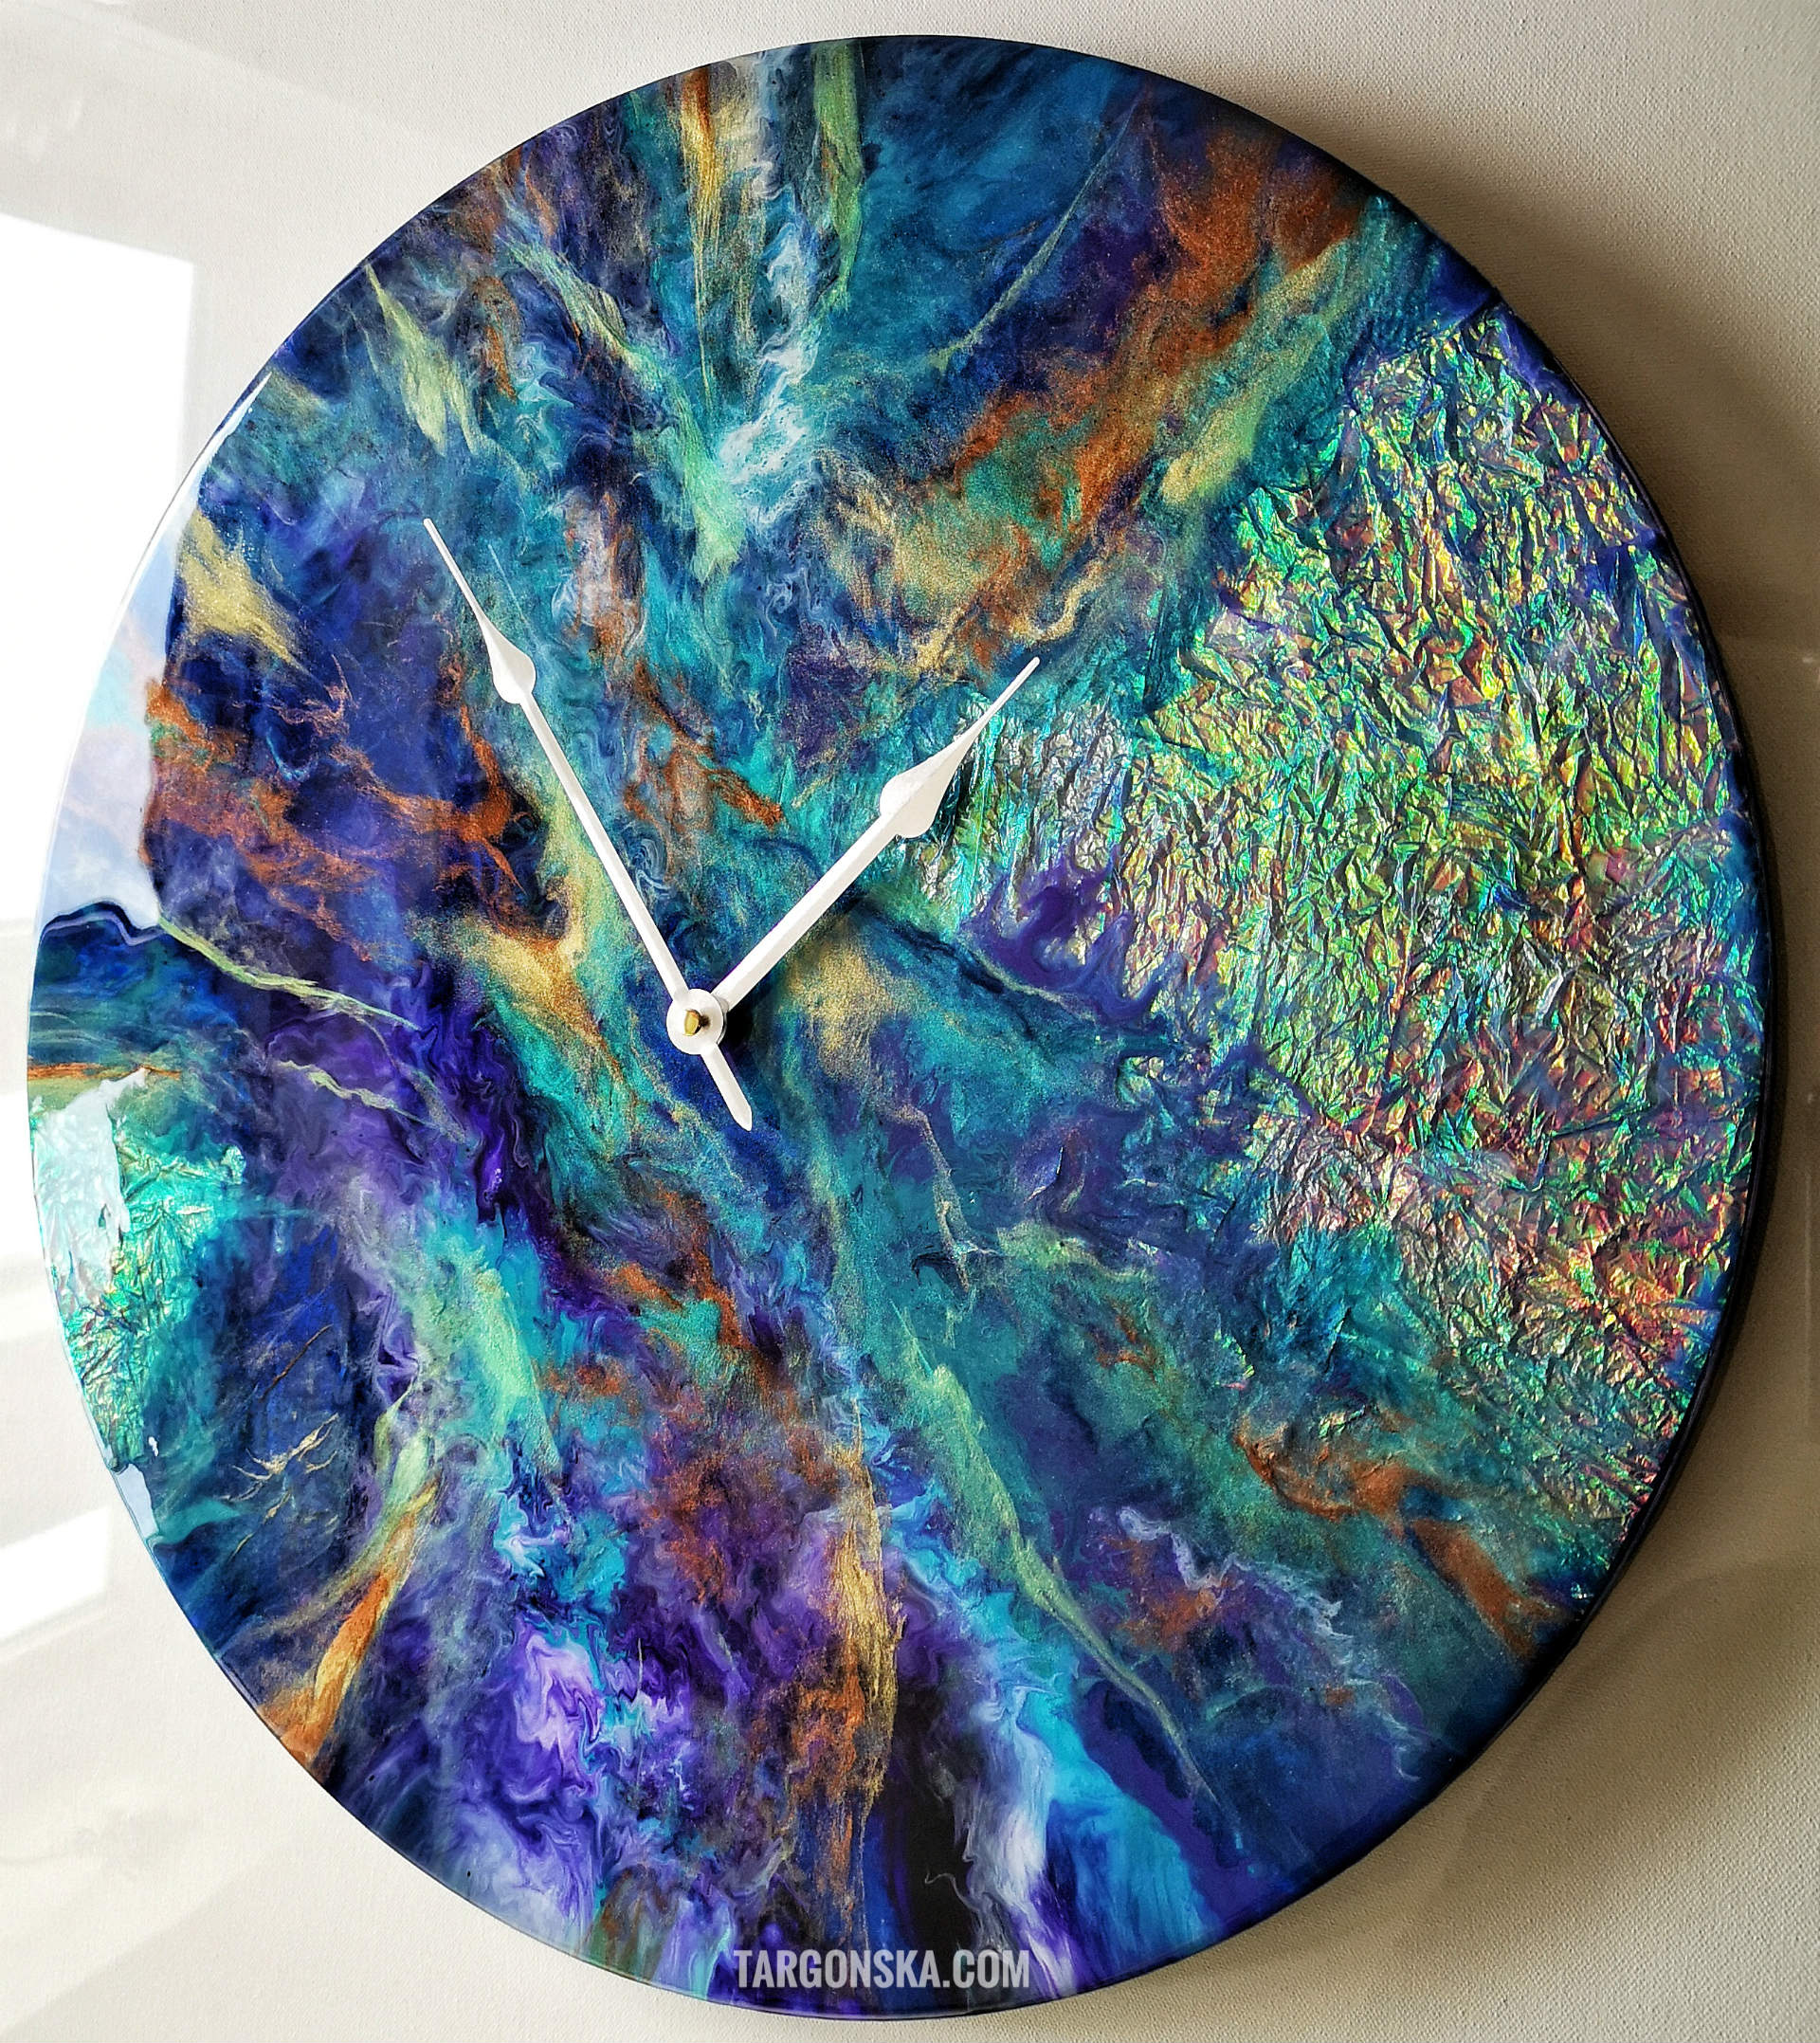 Resin art Clock no 5 Cosmic Clock Targonska